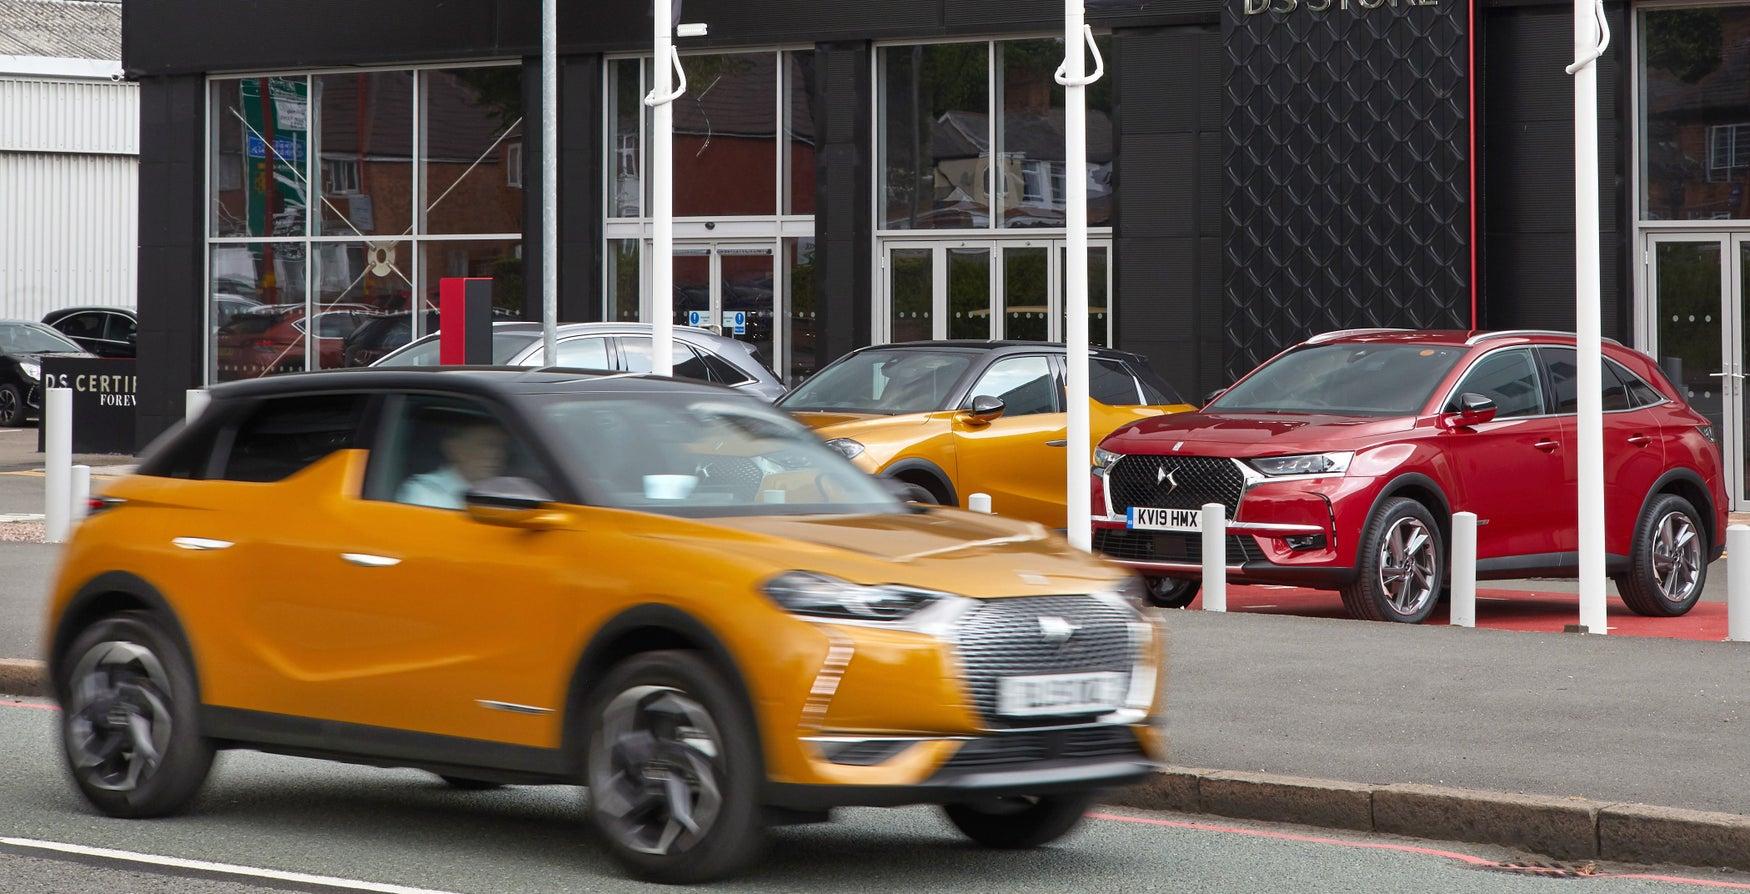 Car showroom Birmingham